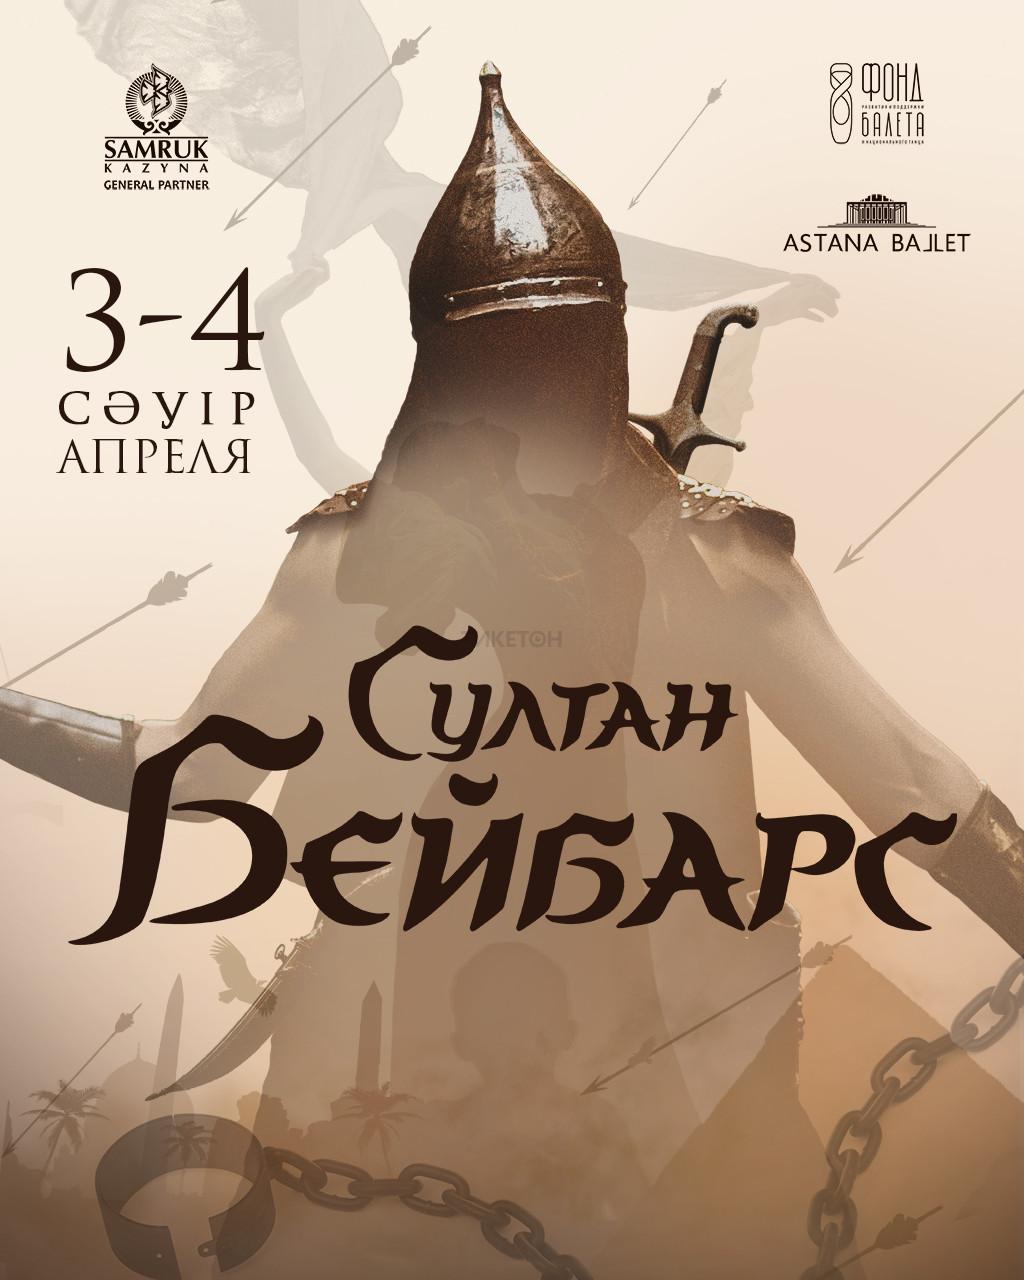 Султан Бейбарыс  (AstanaBallet)